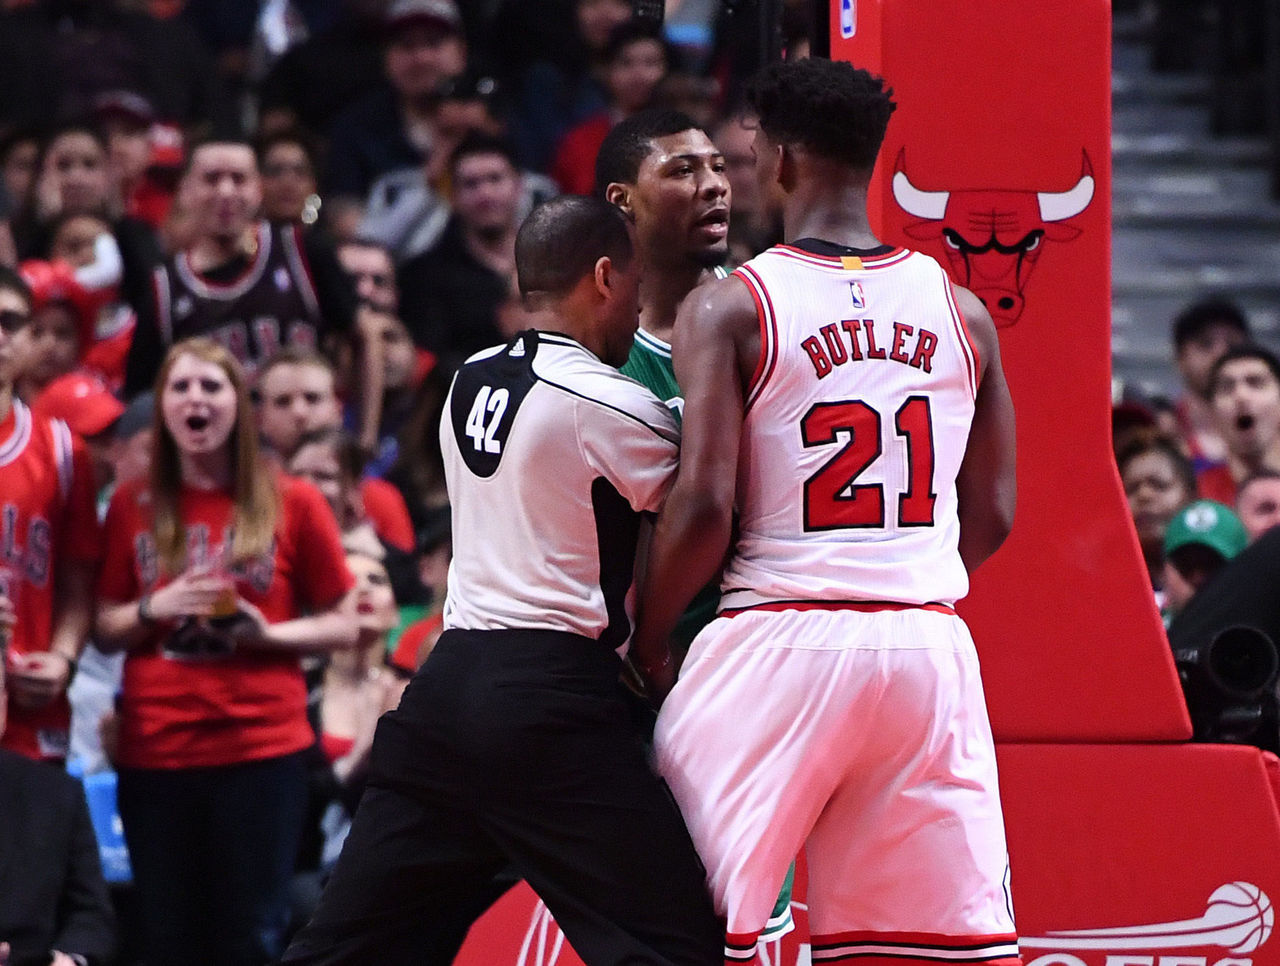 Cropped 2017 04 23t235337z 1687574853 nocid rtrmadp 3 nba playoffs boston celtics at chicago bulls